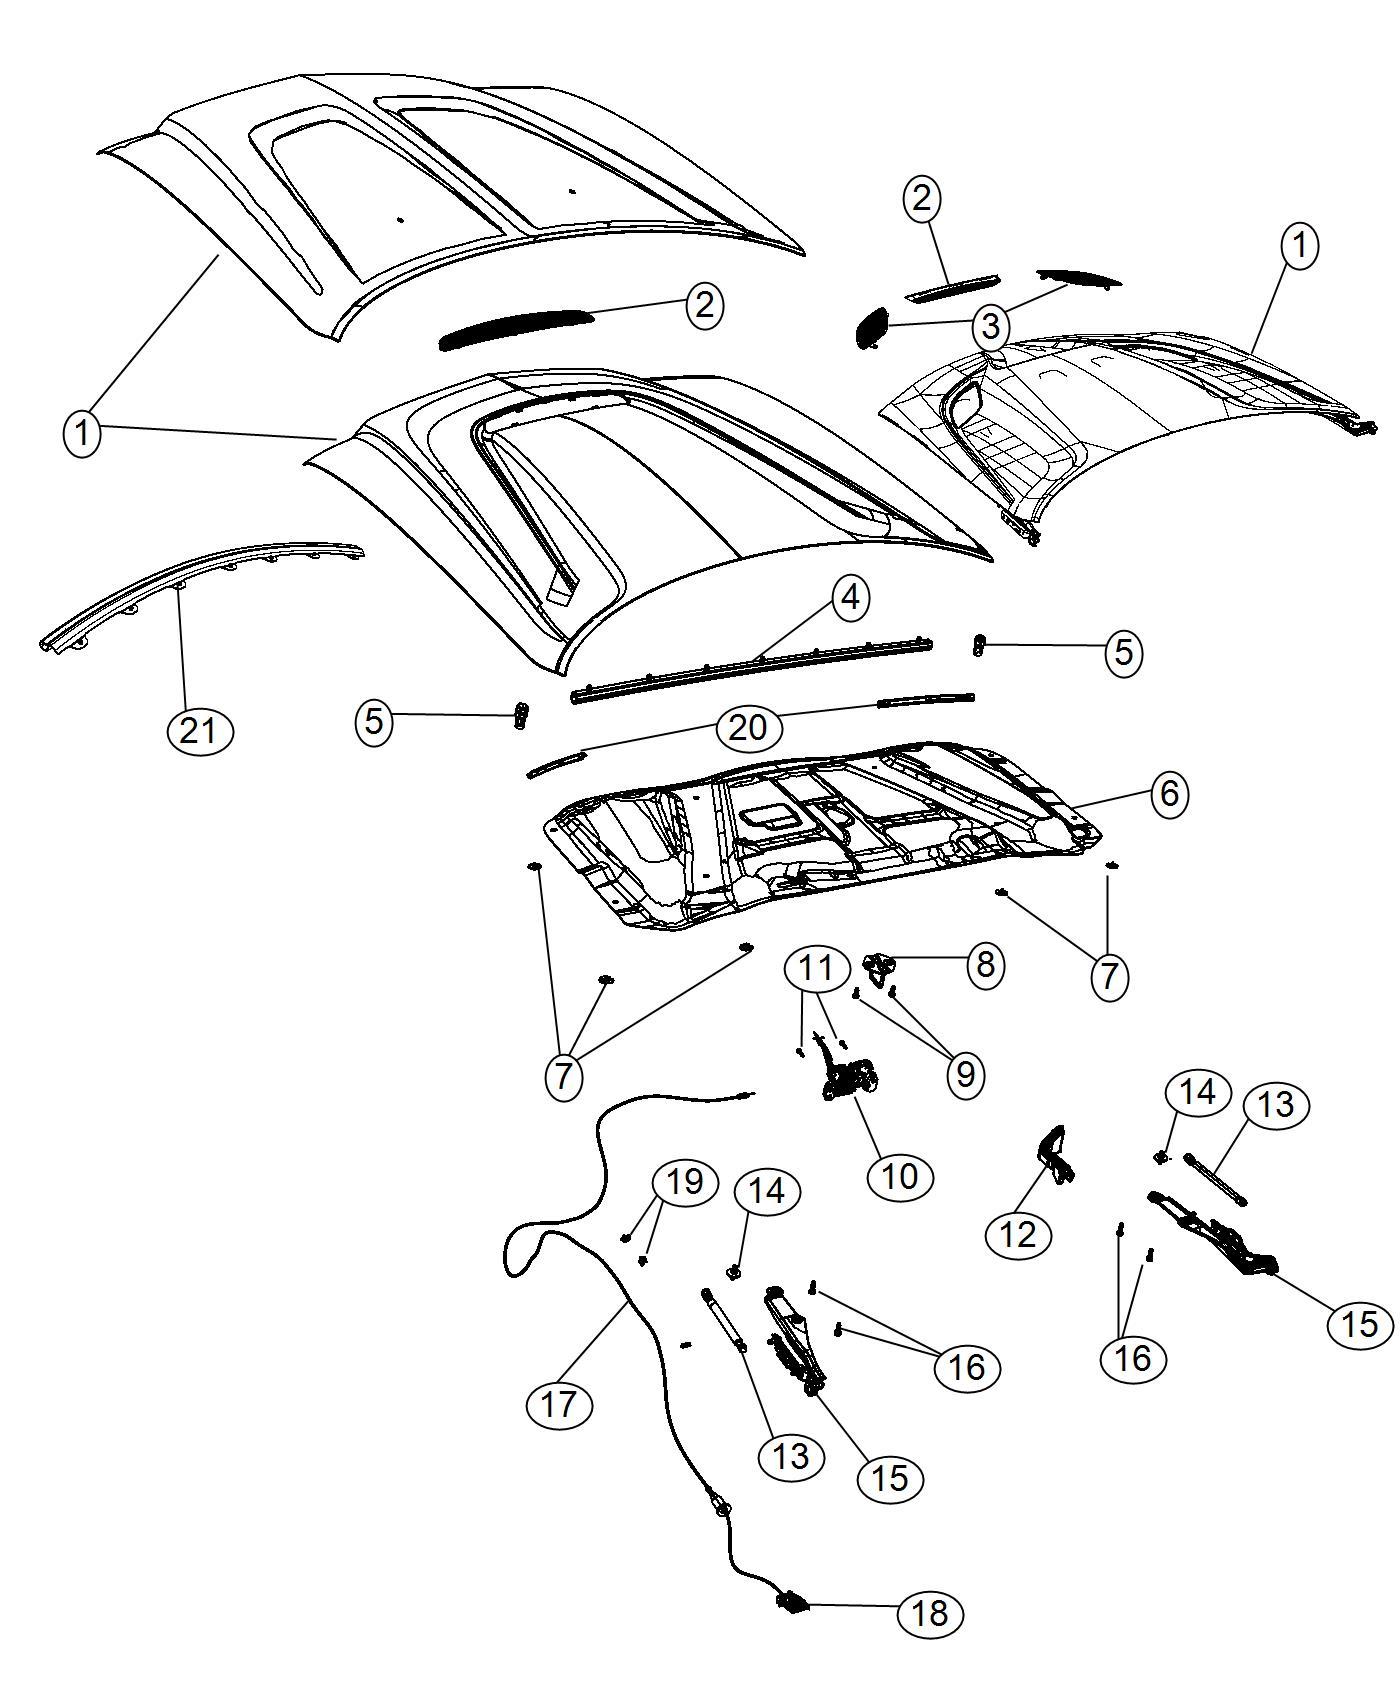 2014 Dodge Challenger Weatherstrip. Hood to radiator